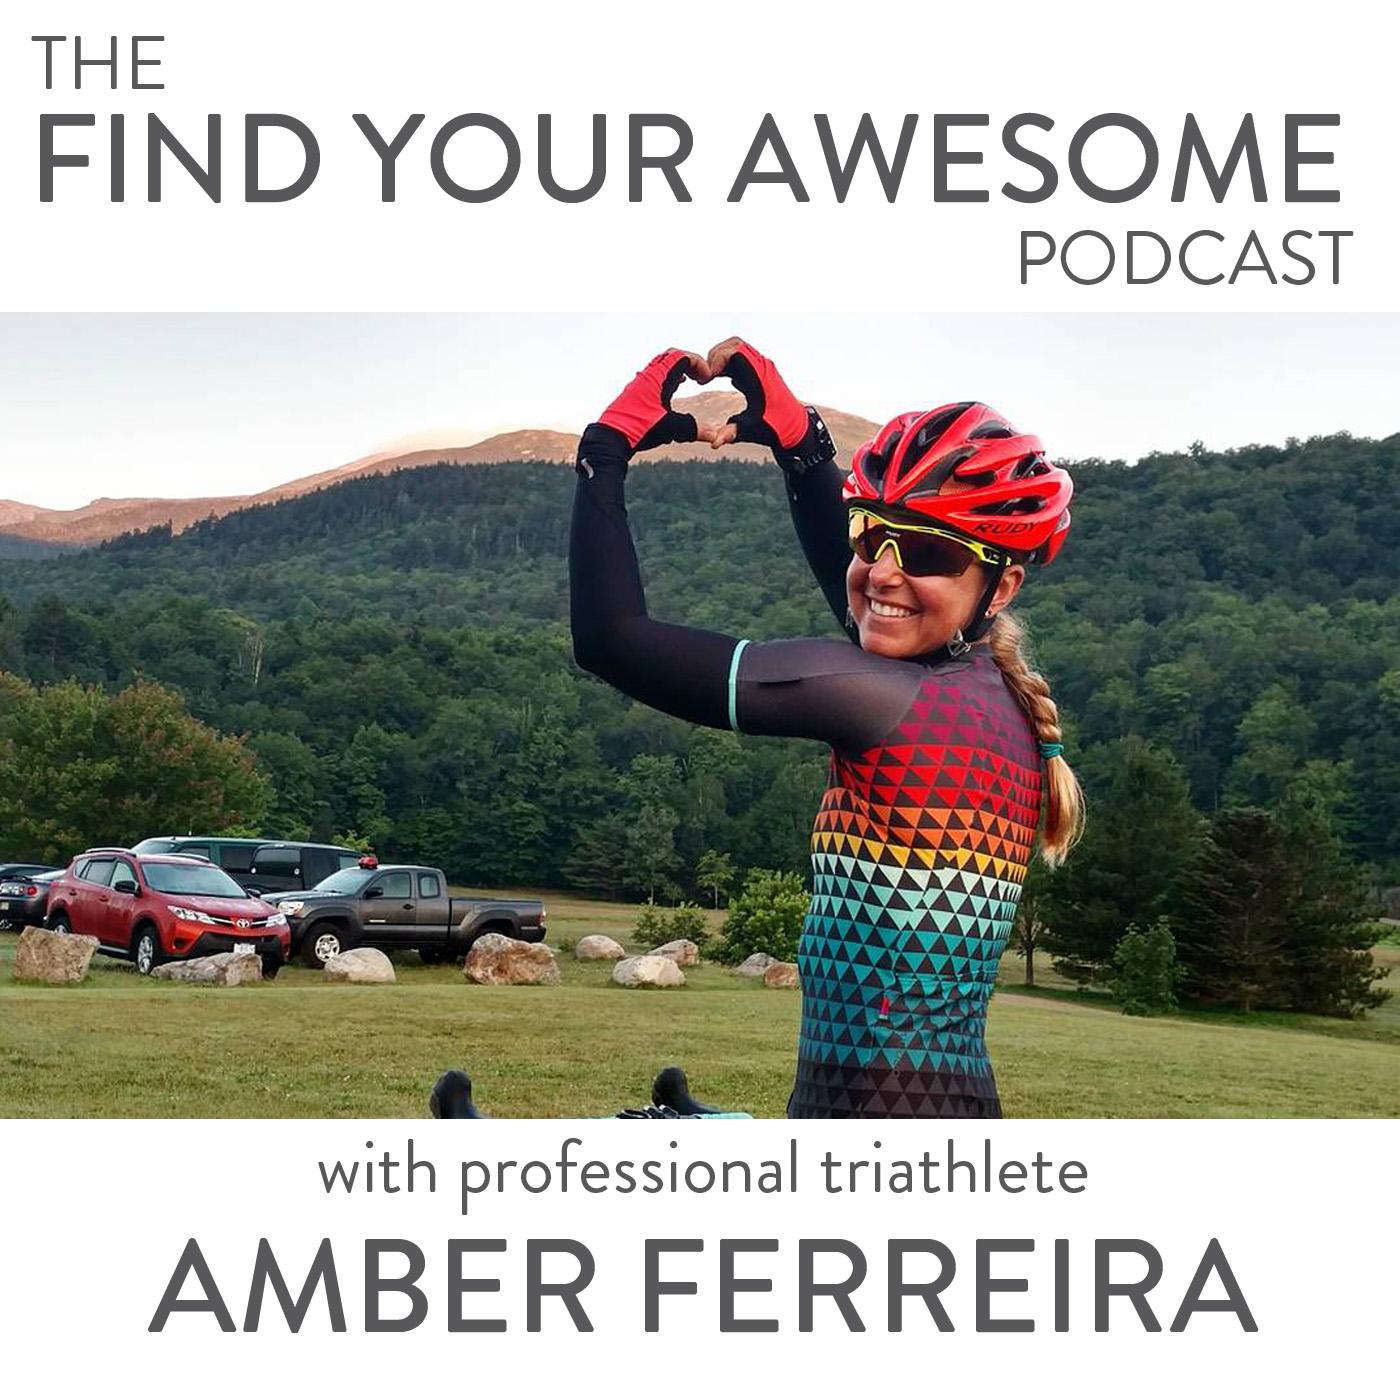 AmberFerreira_podcast_coverart.jpg